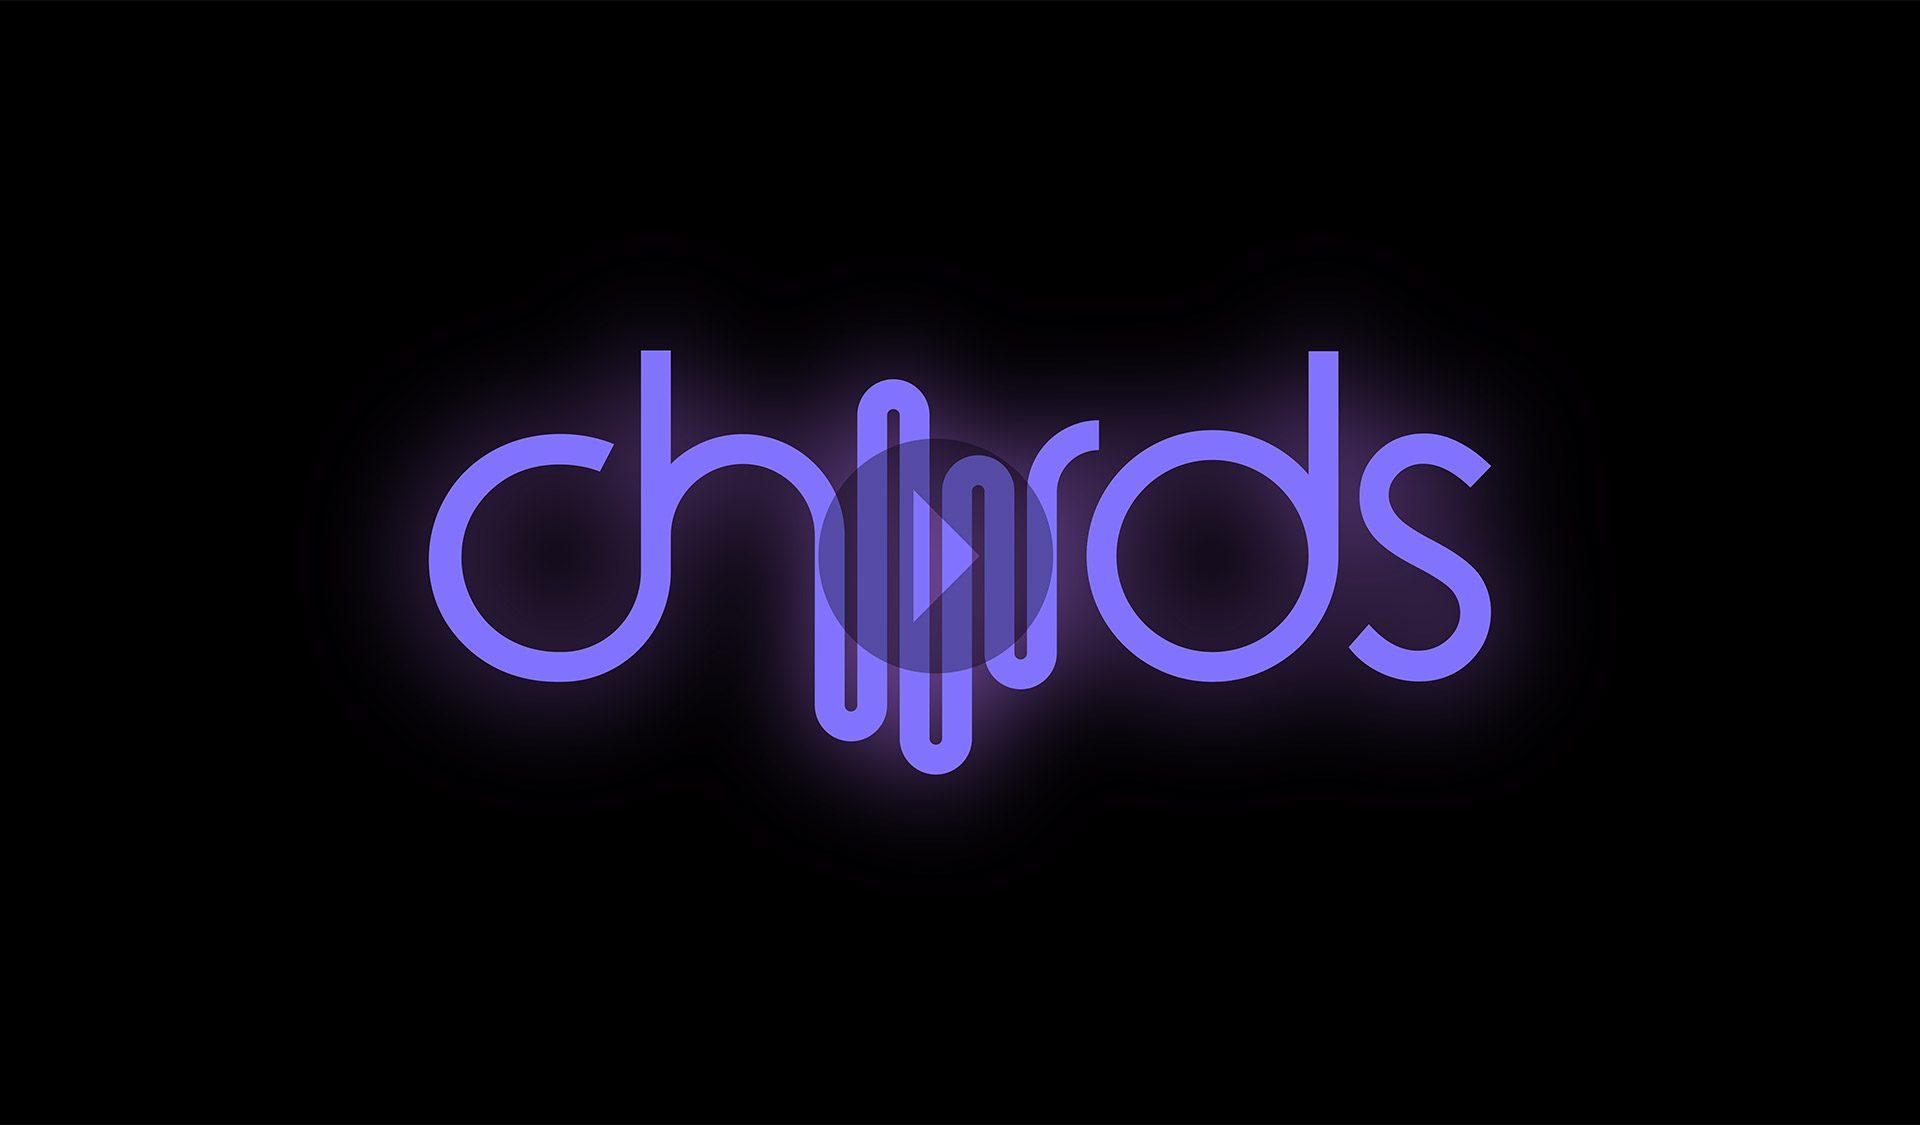 CHORDS 02